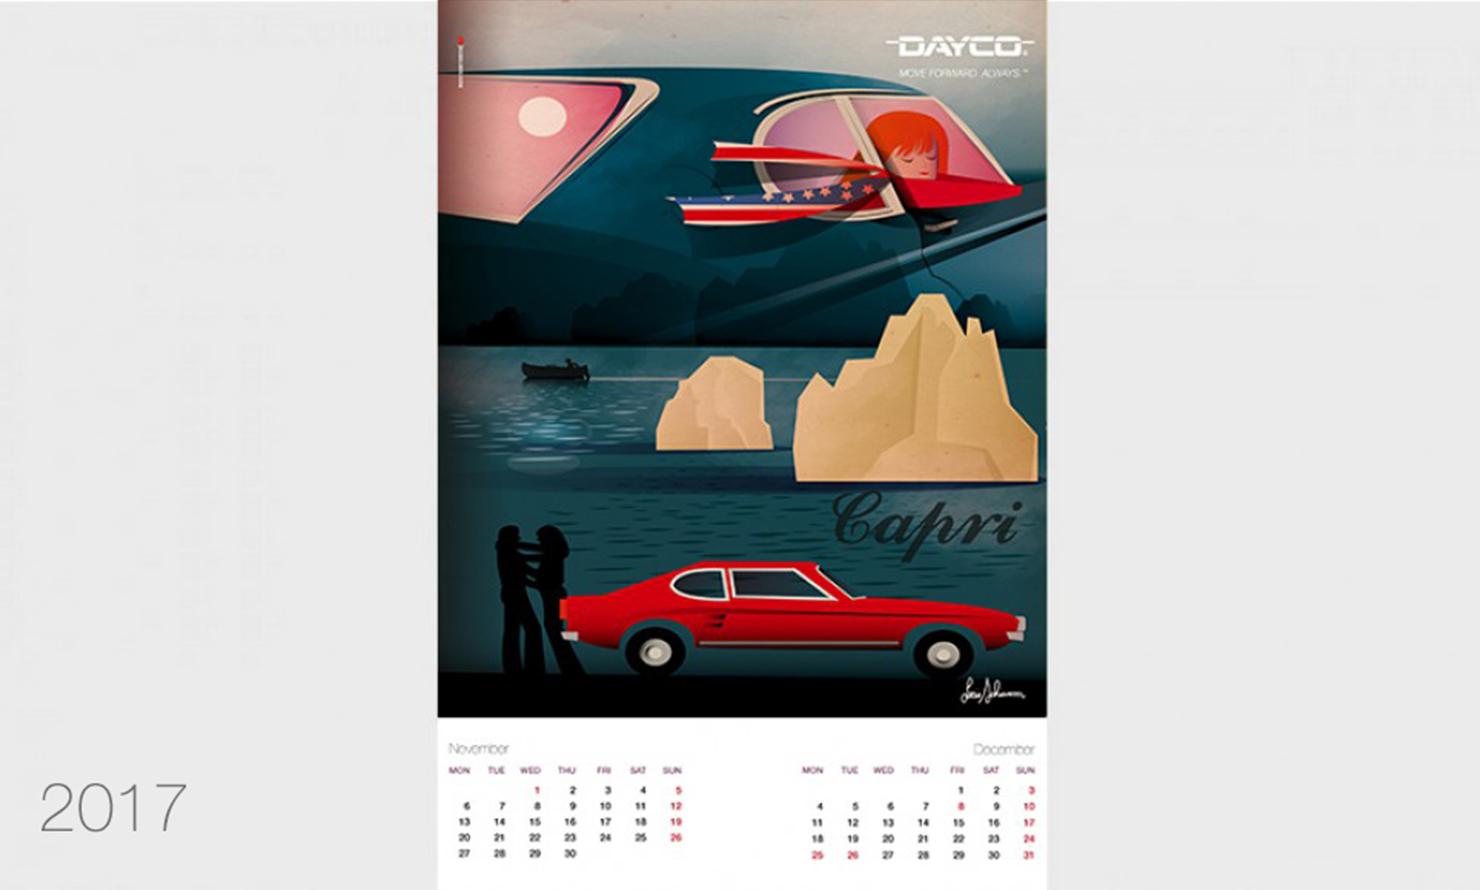 https://kubelibre.com/uploads/Slider-work-tutti-clienti/dayco-calendario-2017-6.jpg